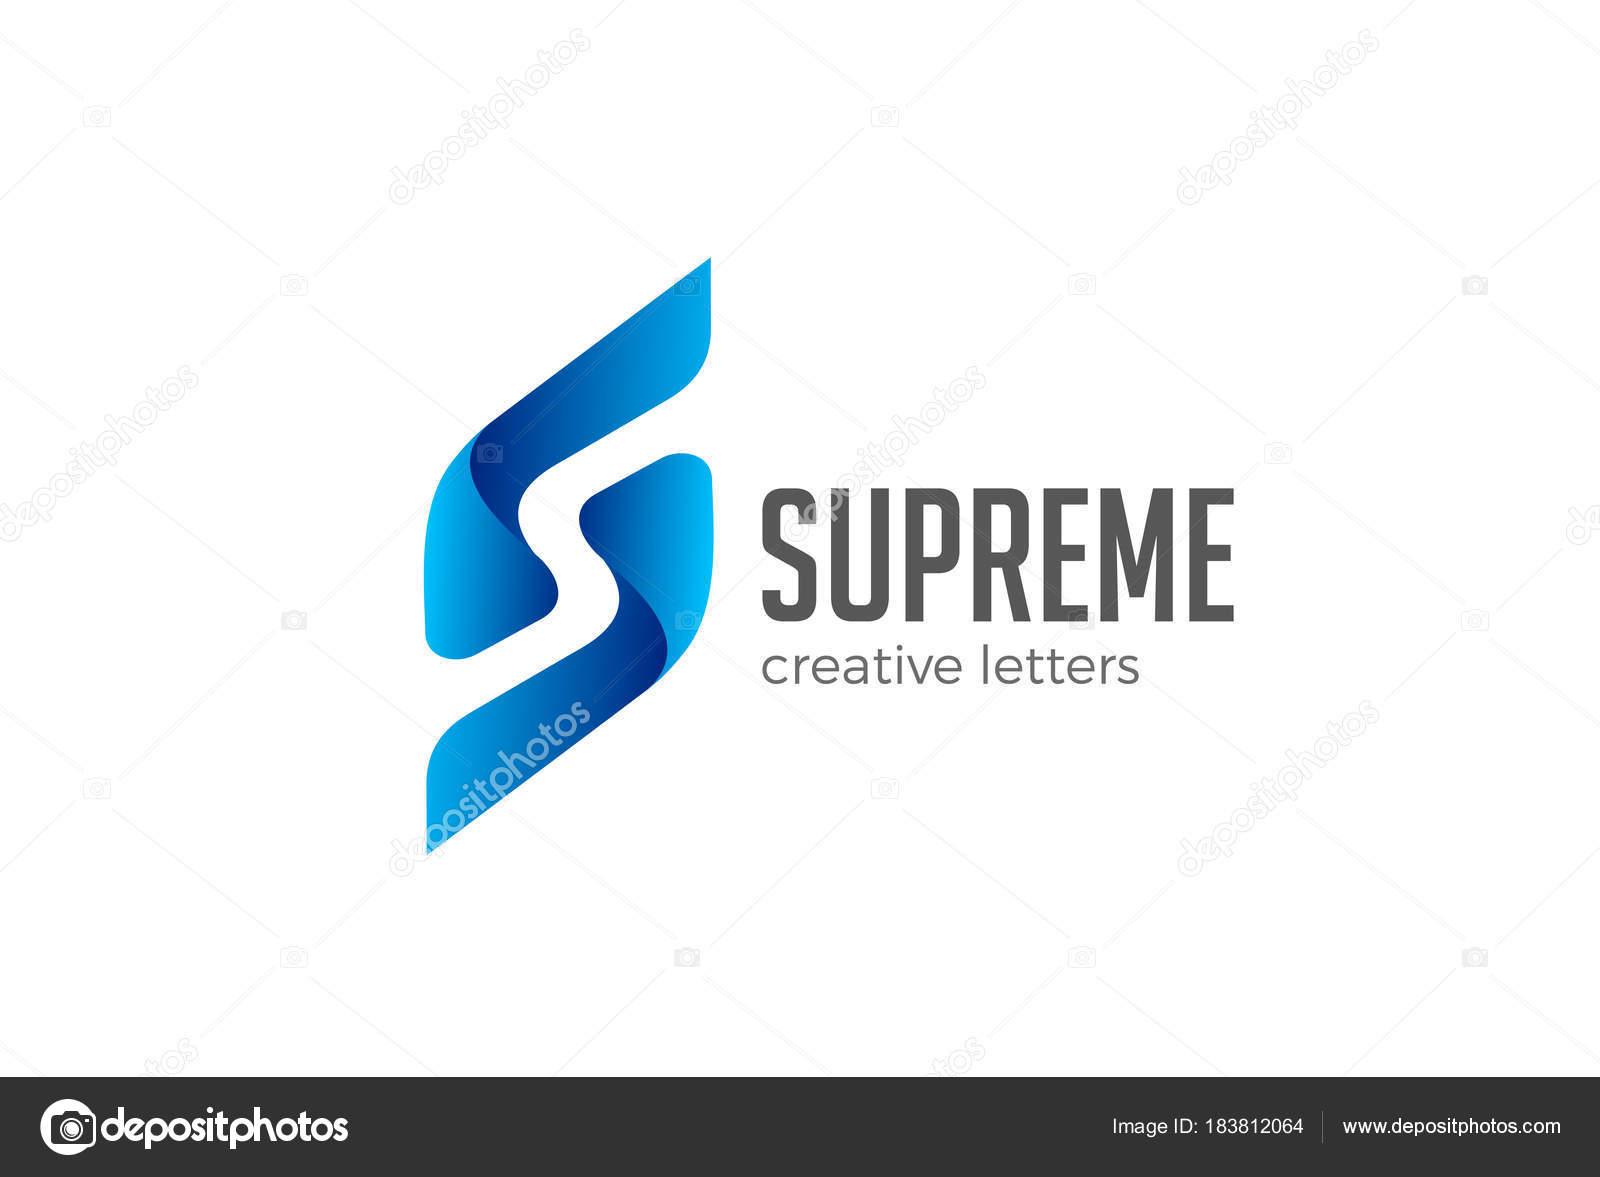 Letter s logo design vector template negative space style corporate letter s logo design vector template negative space style corporate business emblem logotype icon altavistaventures Image collections